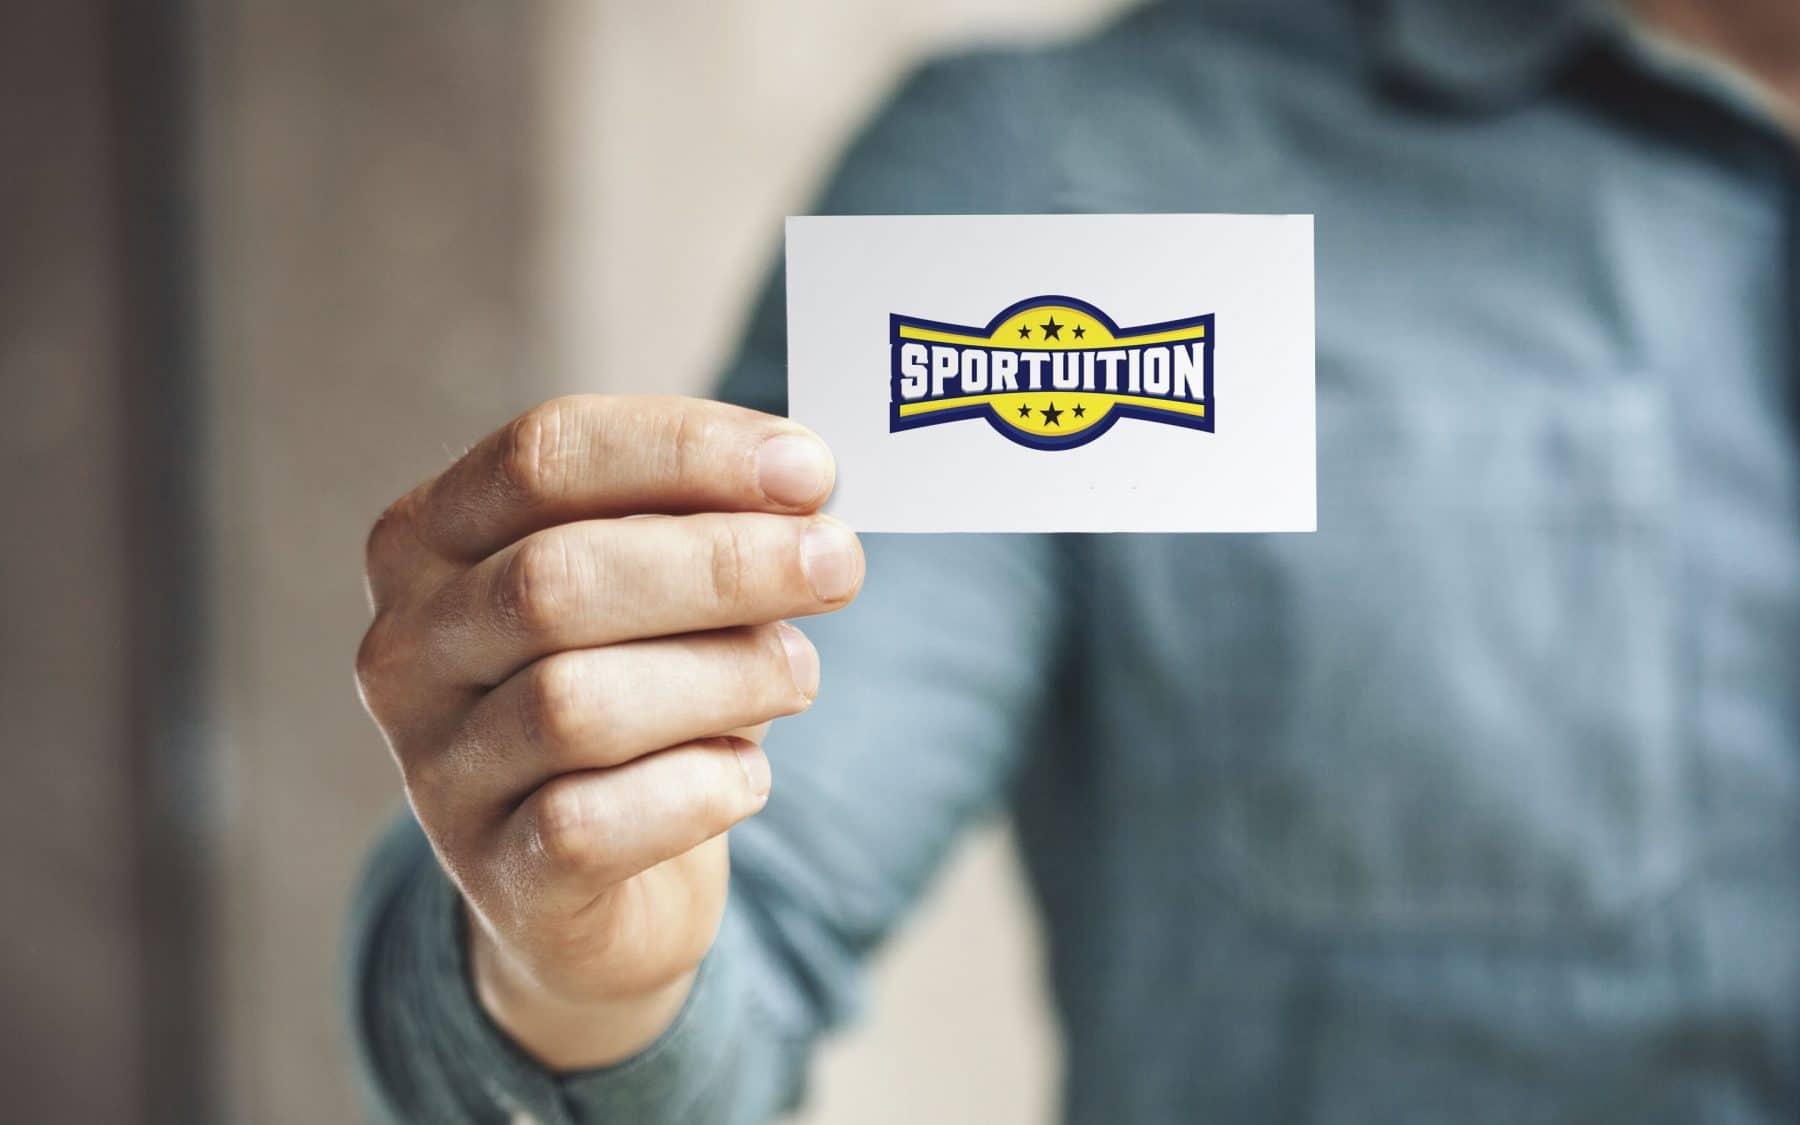 Sportuition 1